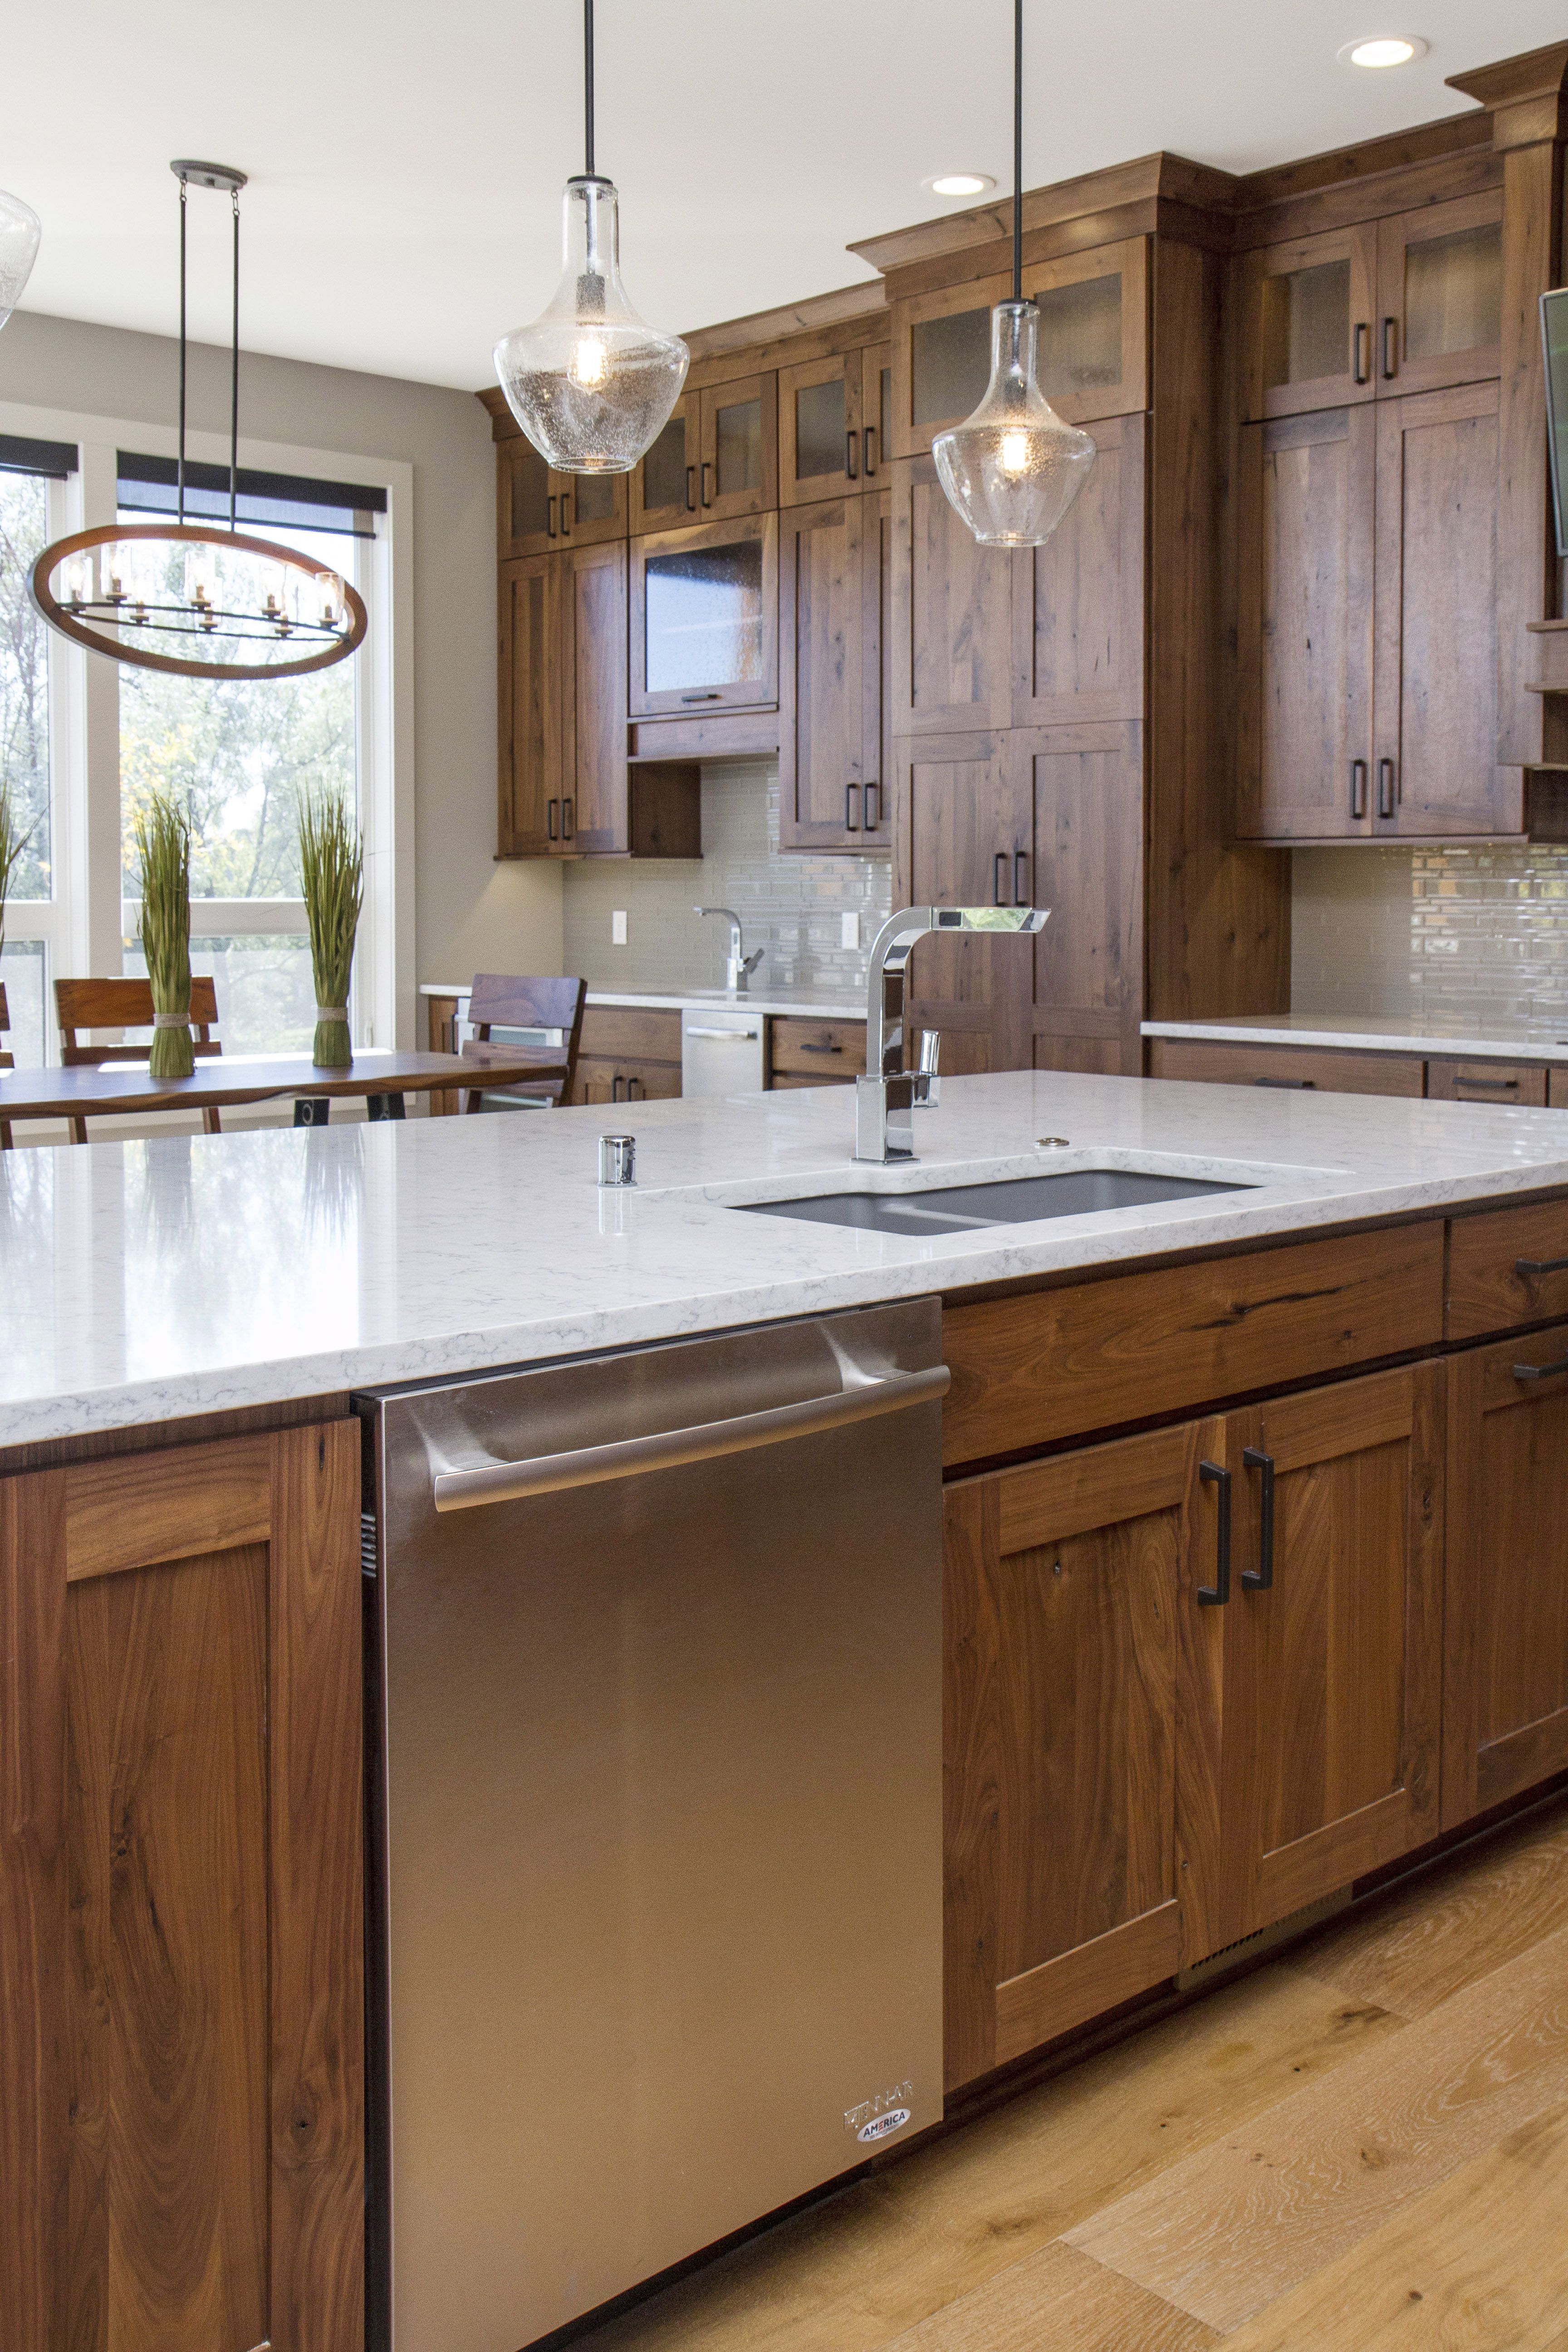 Bigcreek Knotty Walnut Natural Lake House Kitchen Home Kitchens Kitchen Cabinet Manufacturers